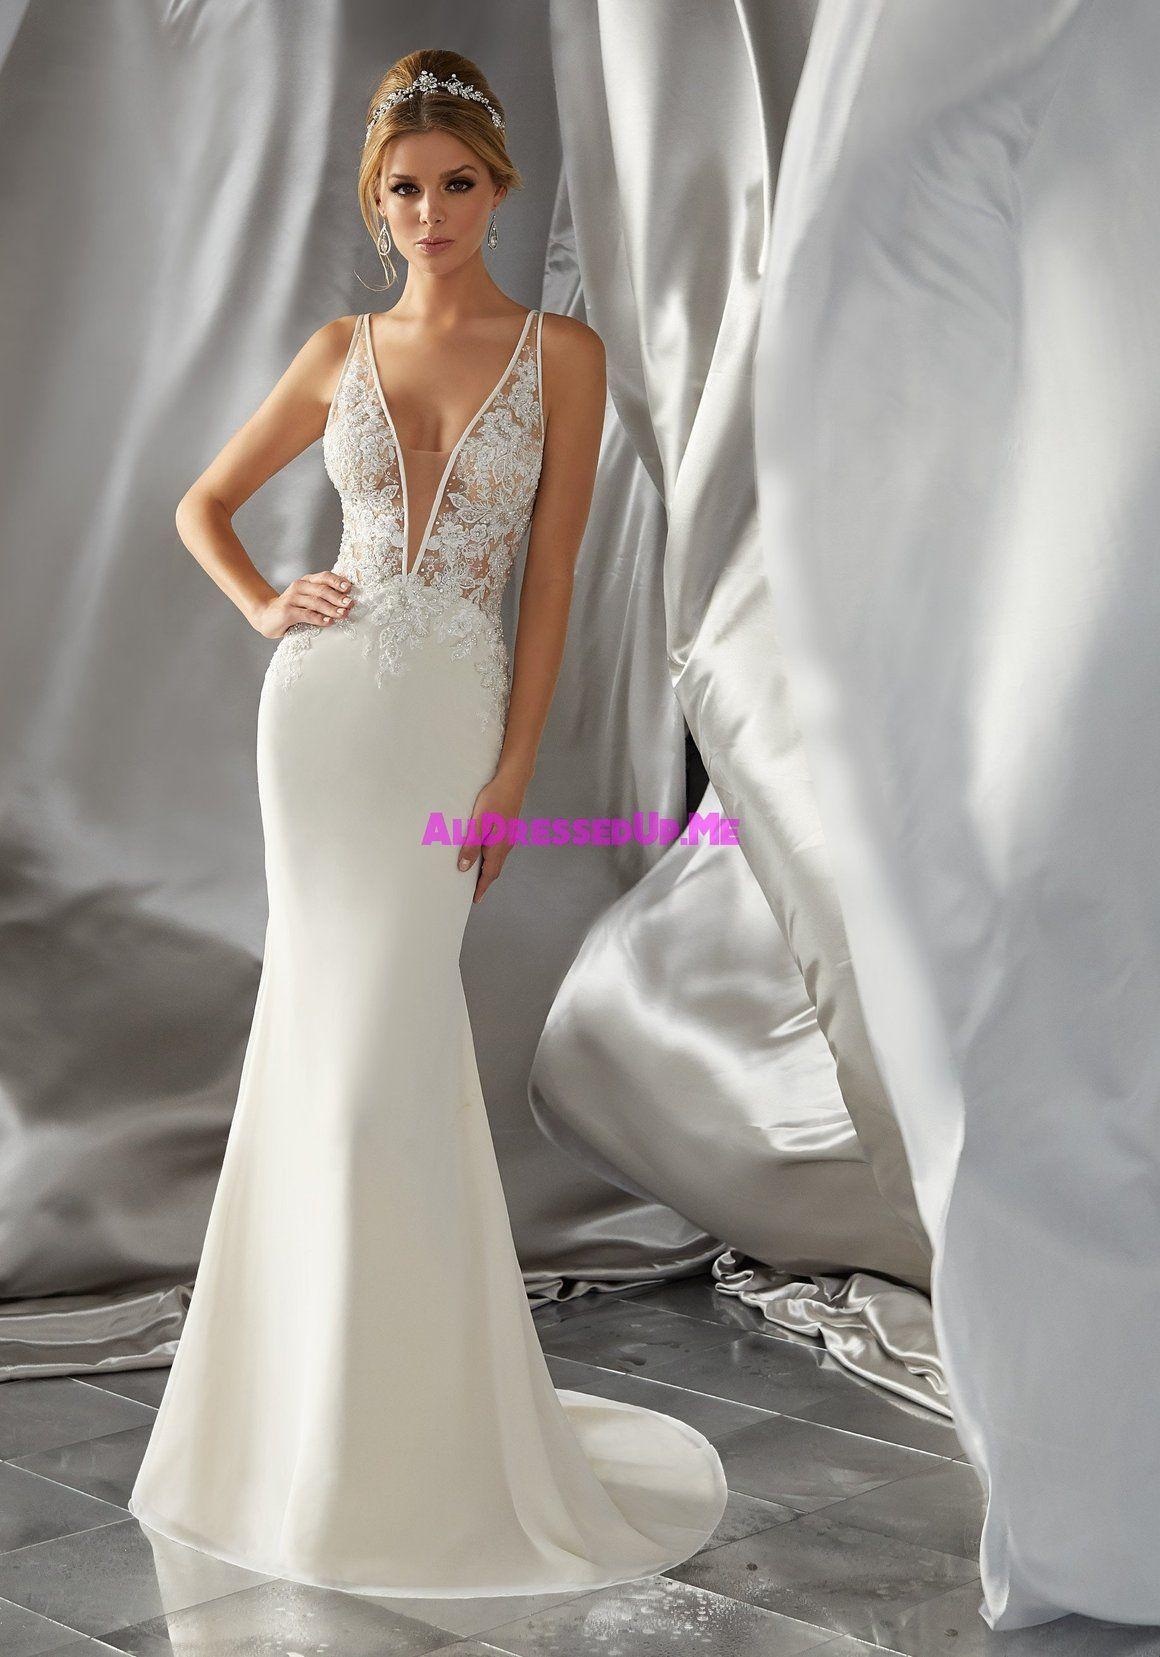 Voyage Malin 6870 Cheron S Bridal Wedding Gown Mori Lee Wedding Dress Bridal Dresses Wedding Dresses